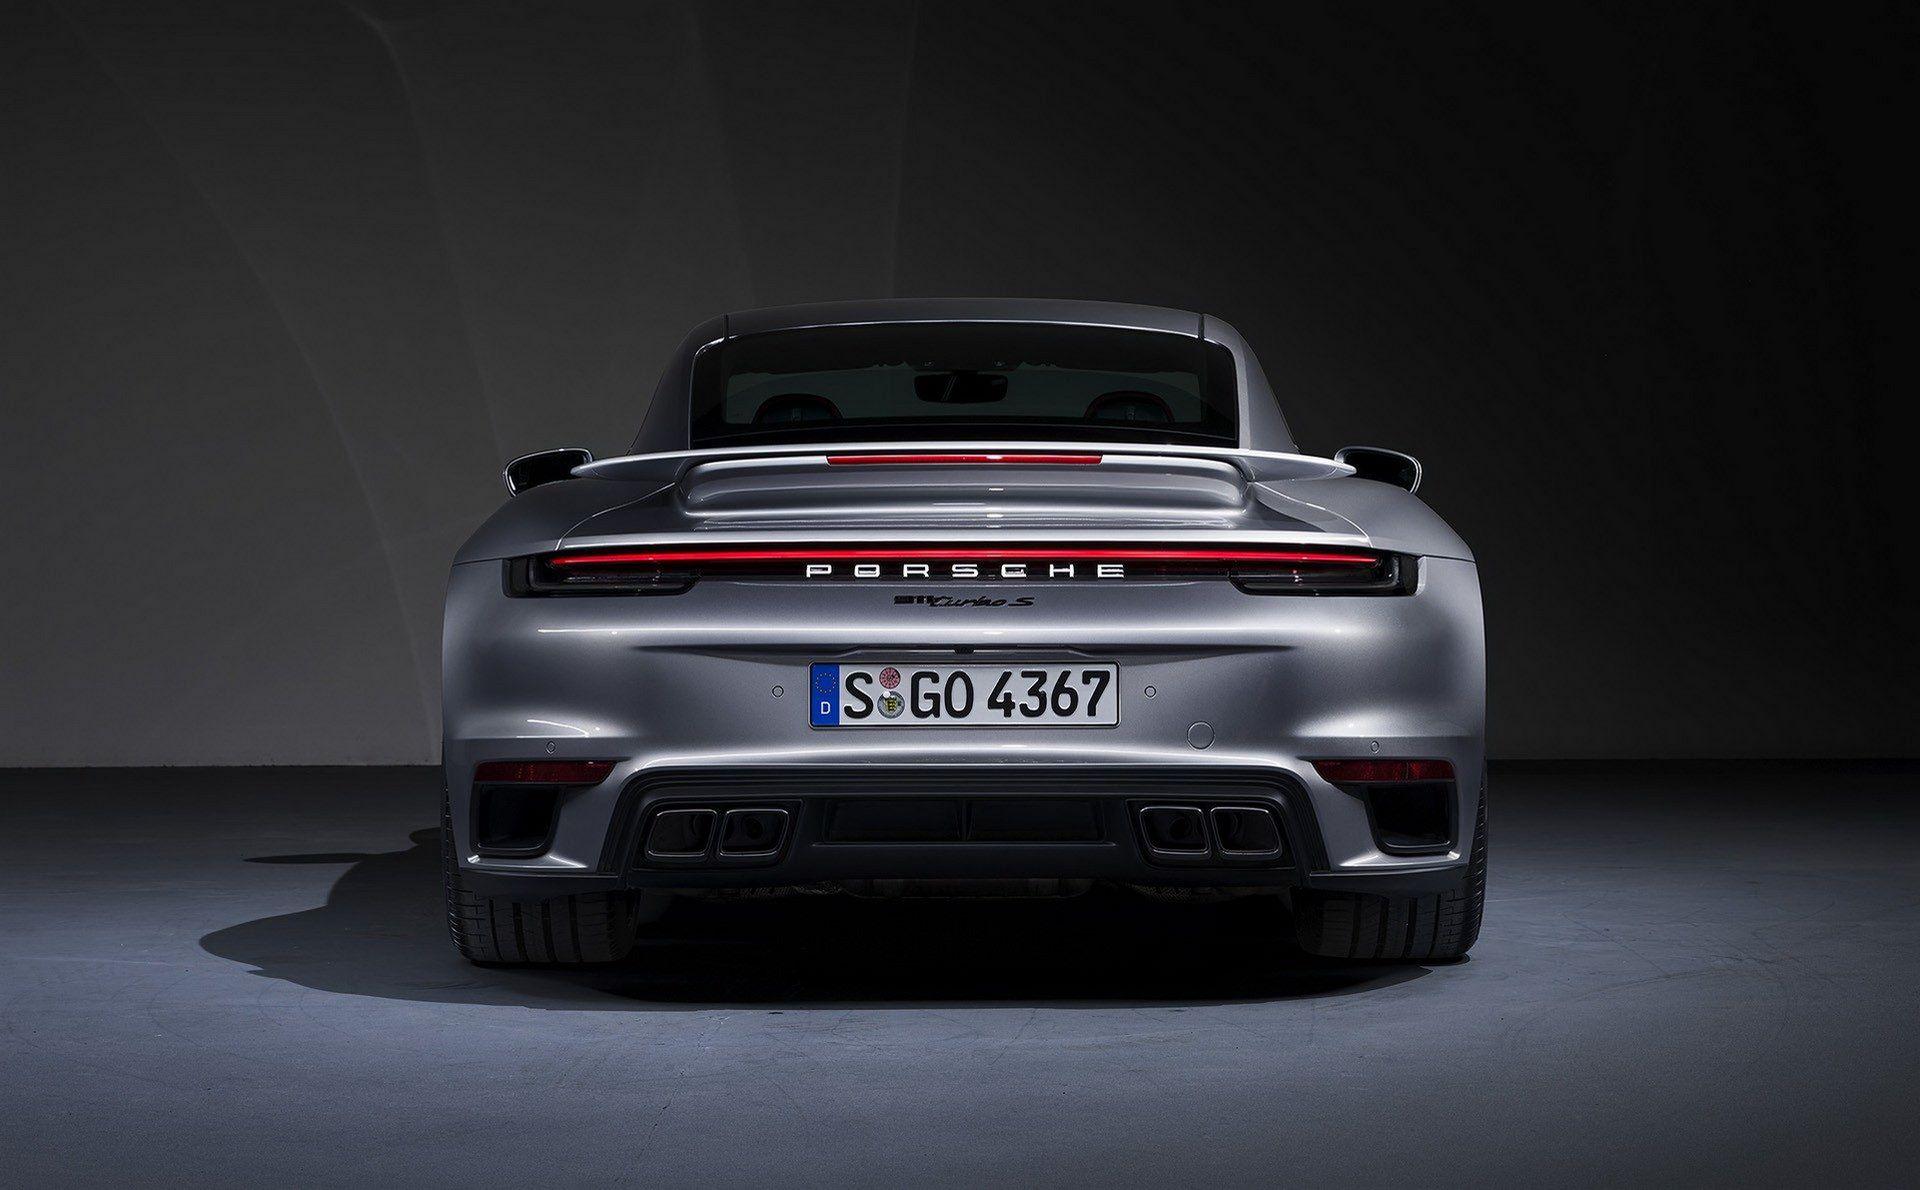 Porsche-911-Turbo-S-2020-27